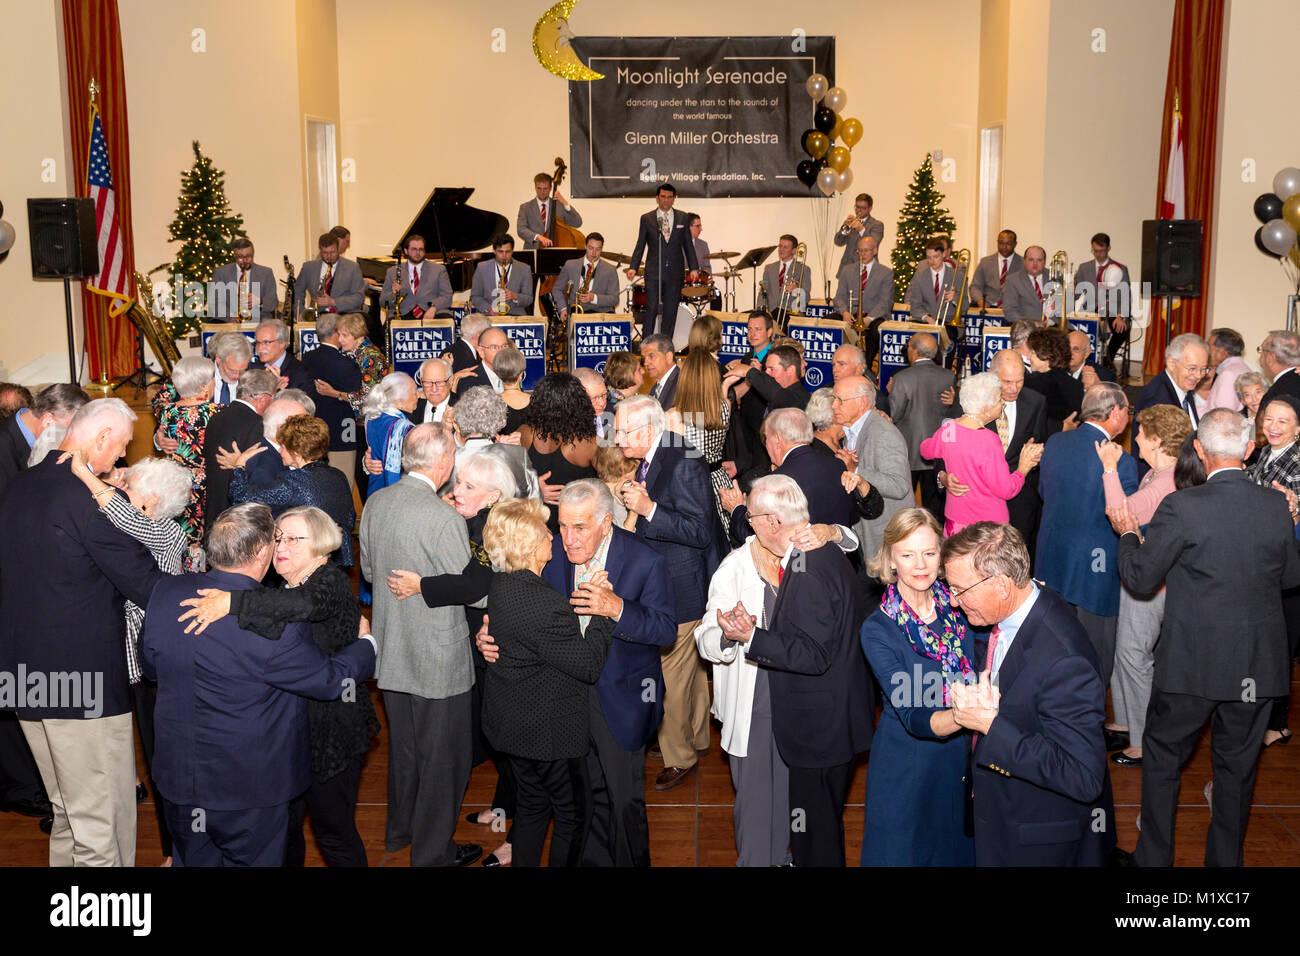 Senioren Tanz bei Bentley Dorf mit dem Glenn Miller Orchestra, Naples, Florida, USA Stockbild